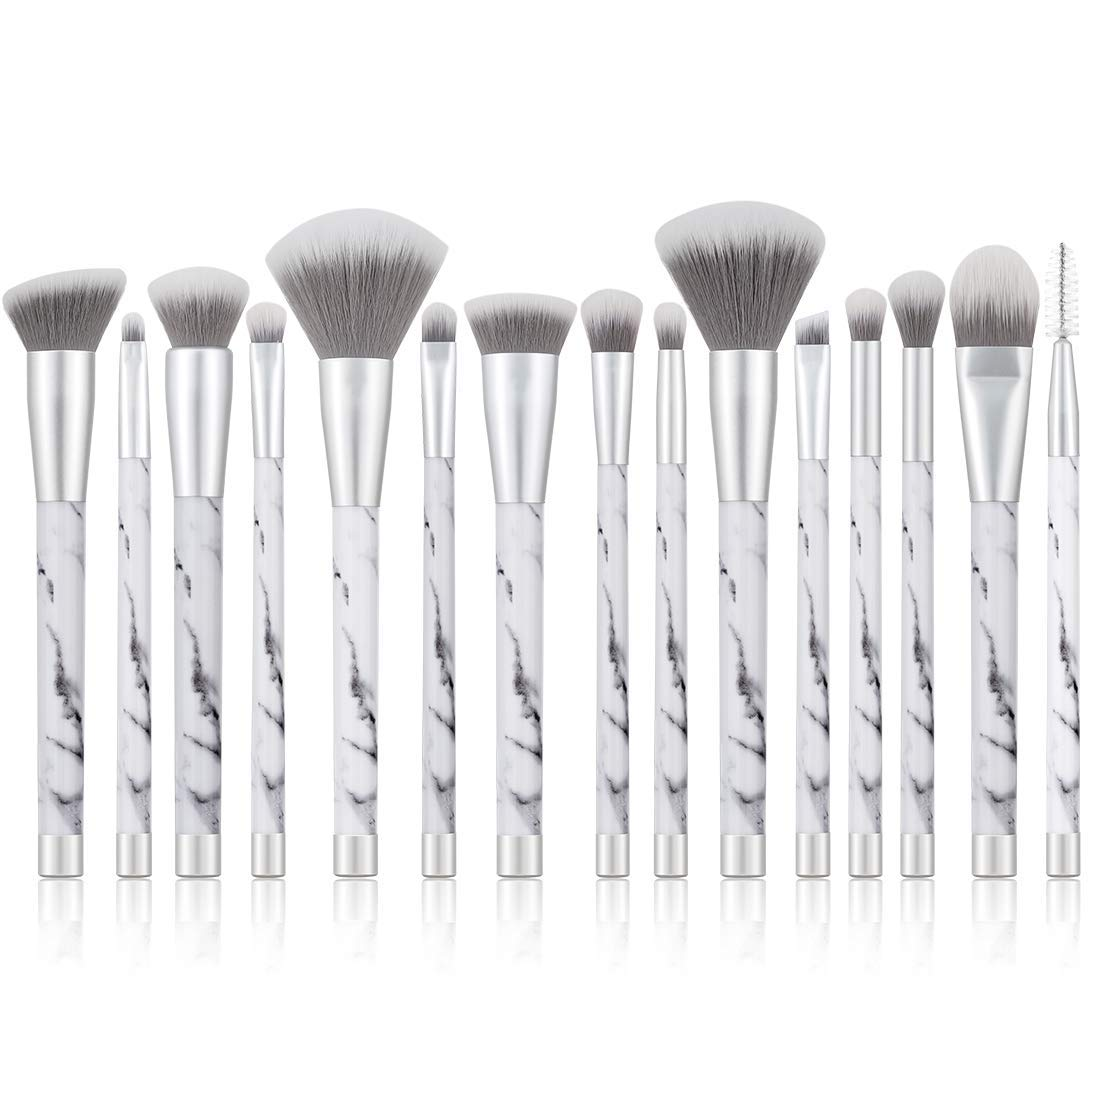 UNIMEIX Marble Makeup Brushes 15 Pieces Makeup Brush Set Premium Face Eyeliner Blush Contour Foundation Cosmetic Brushes for Powder Liquid Cream …